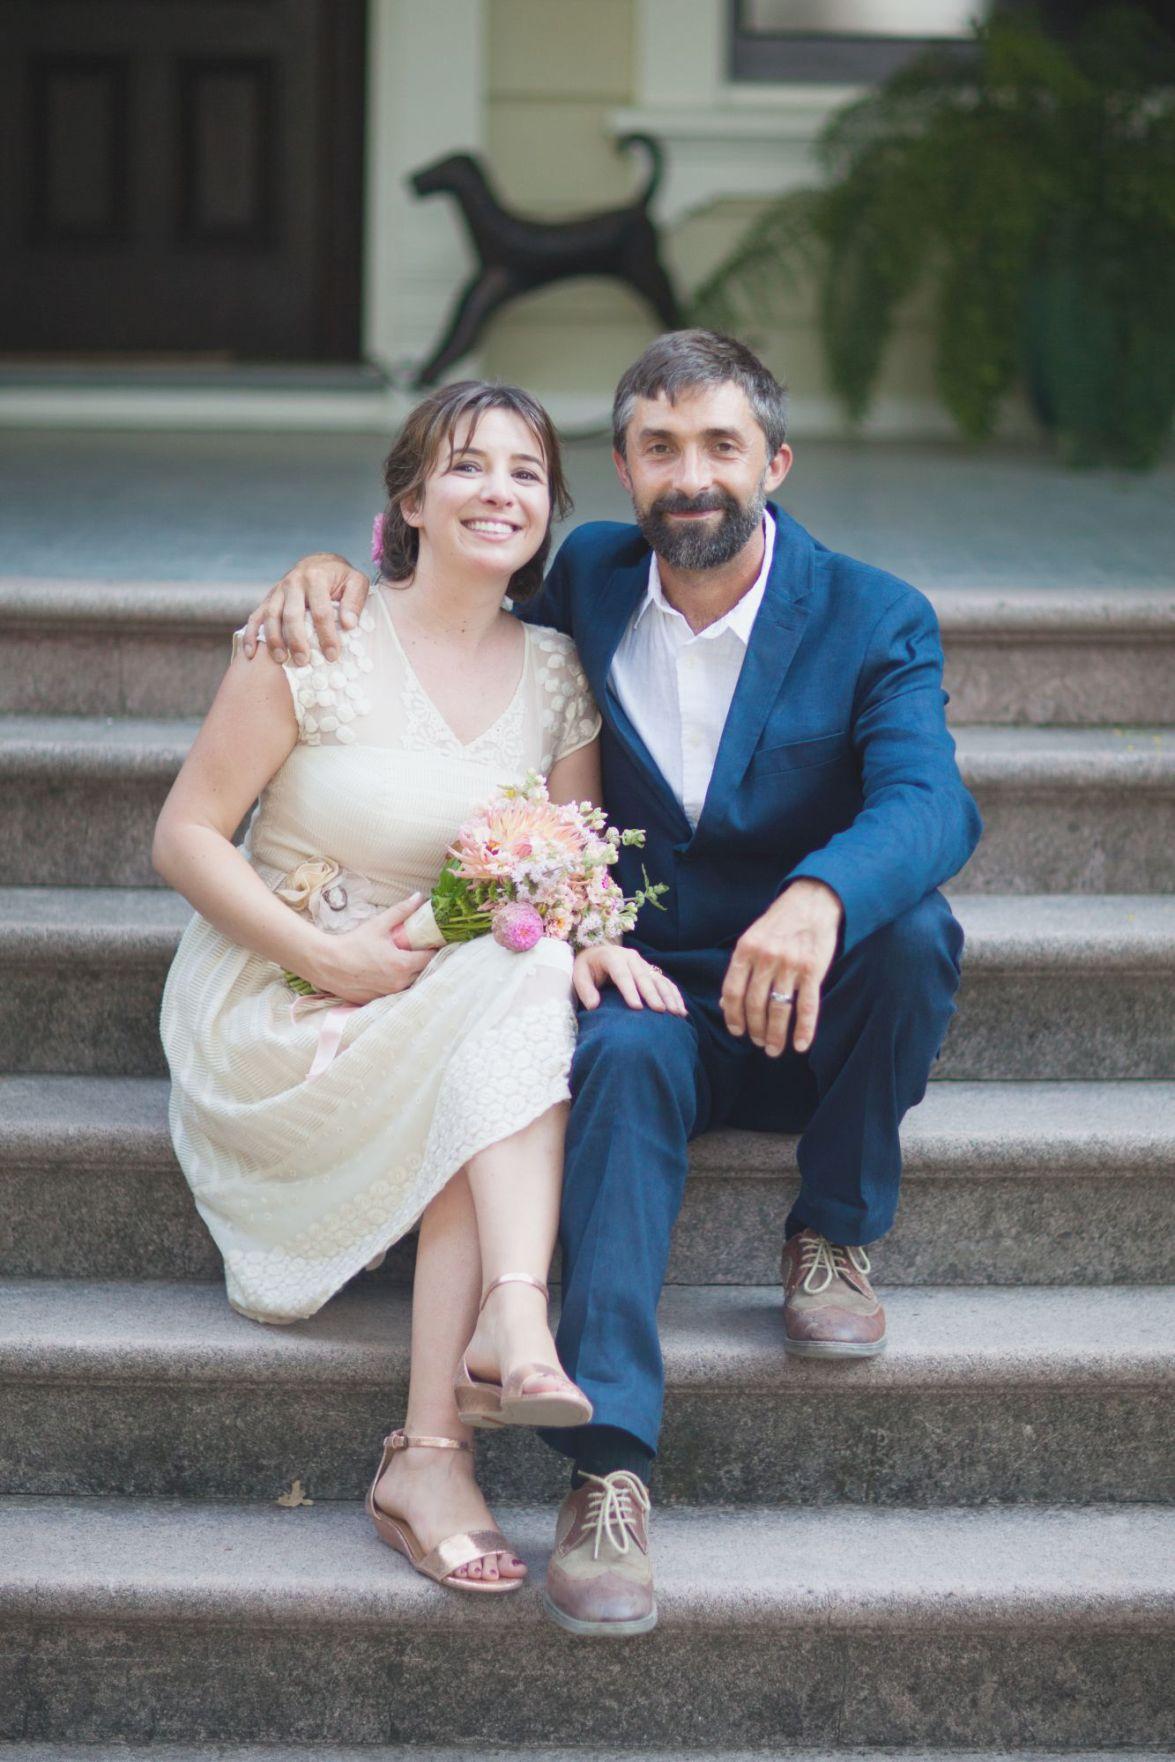 Livia Manfredi and Stephen Price